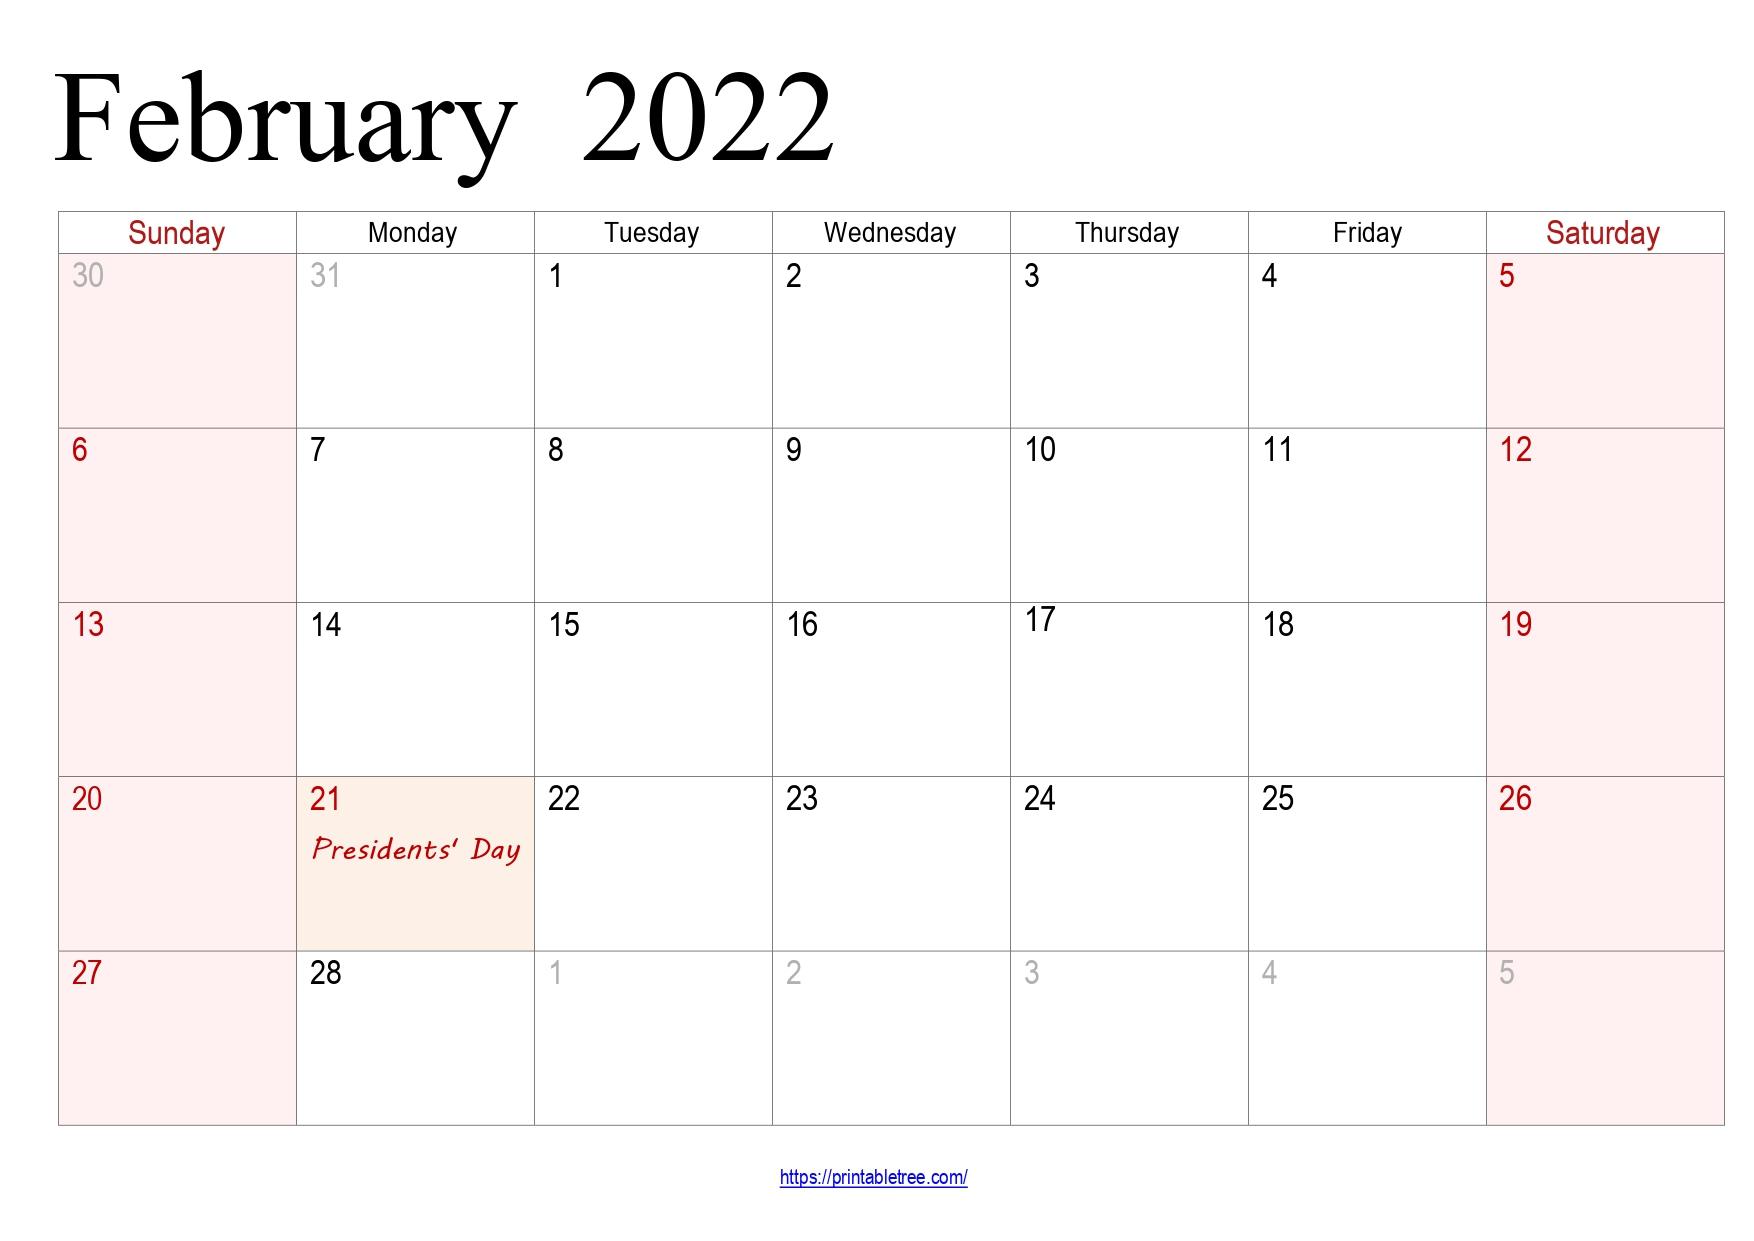 February Calendar 2022 with holidays